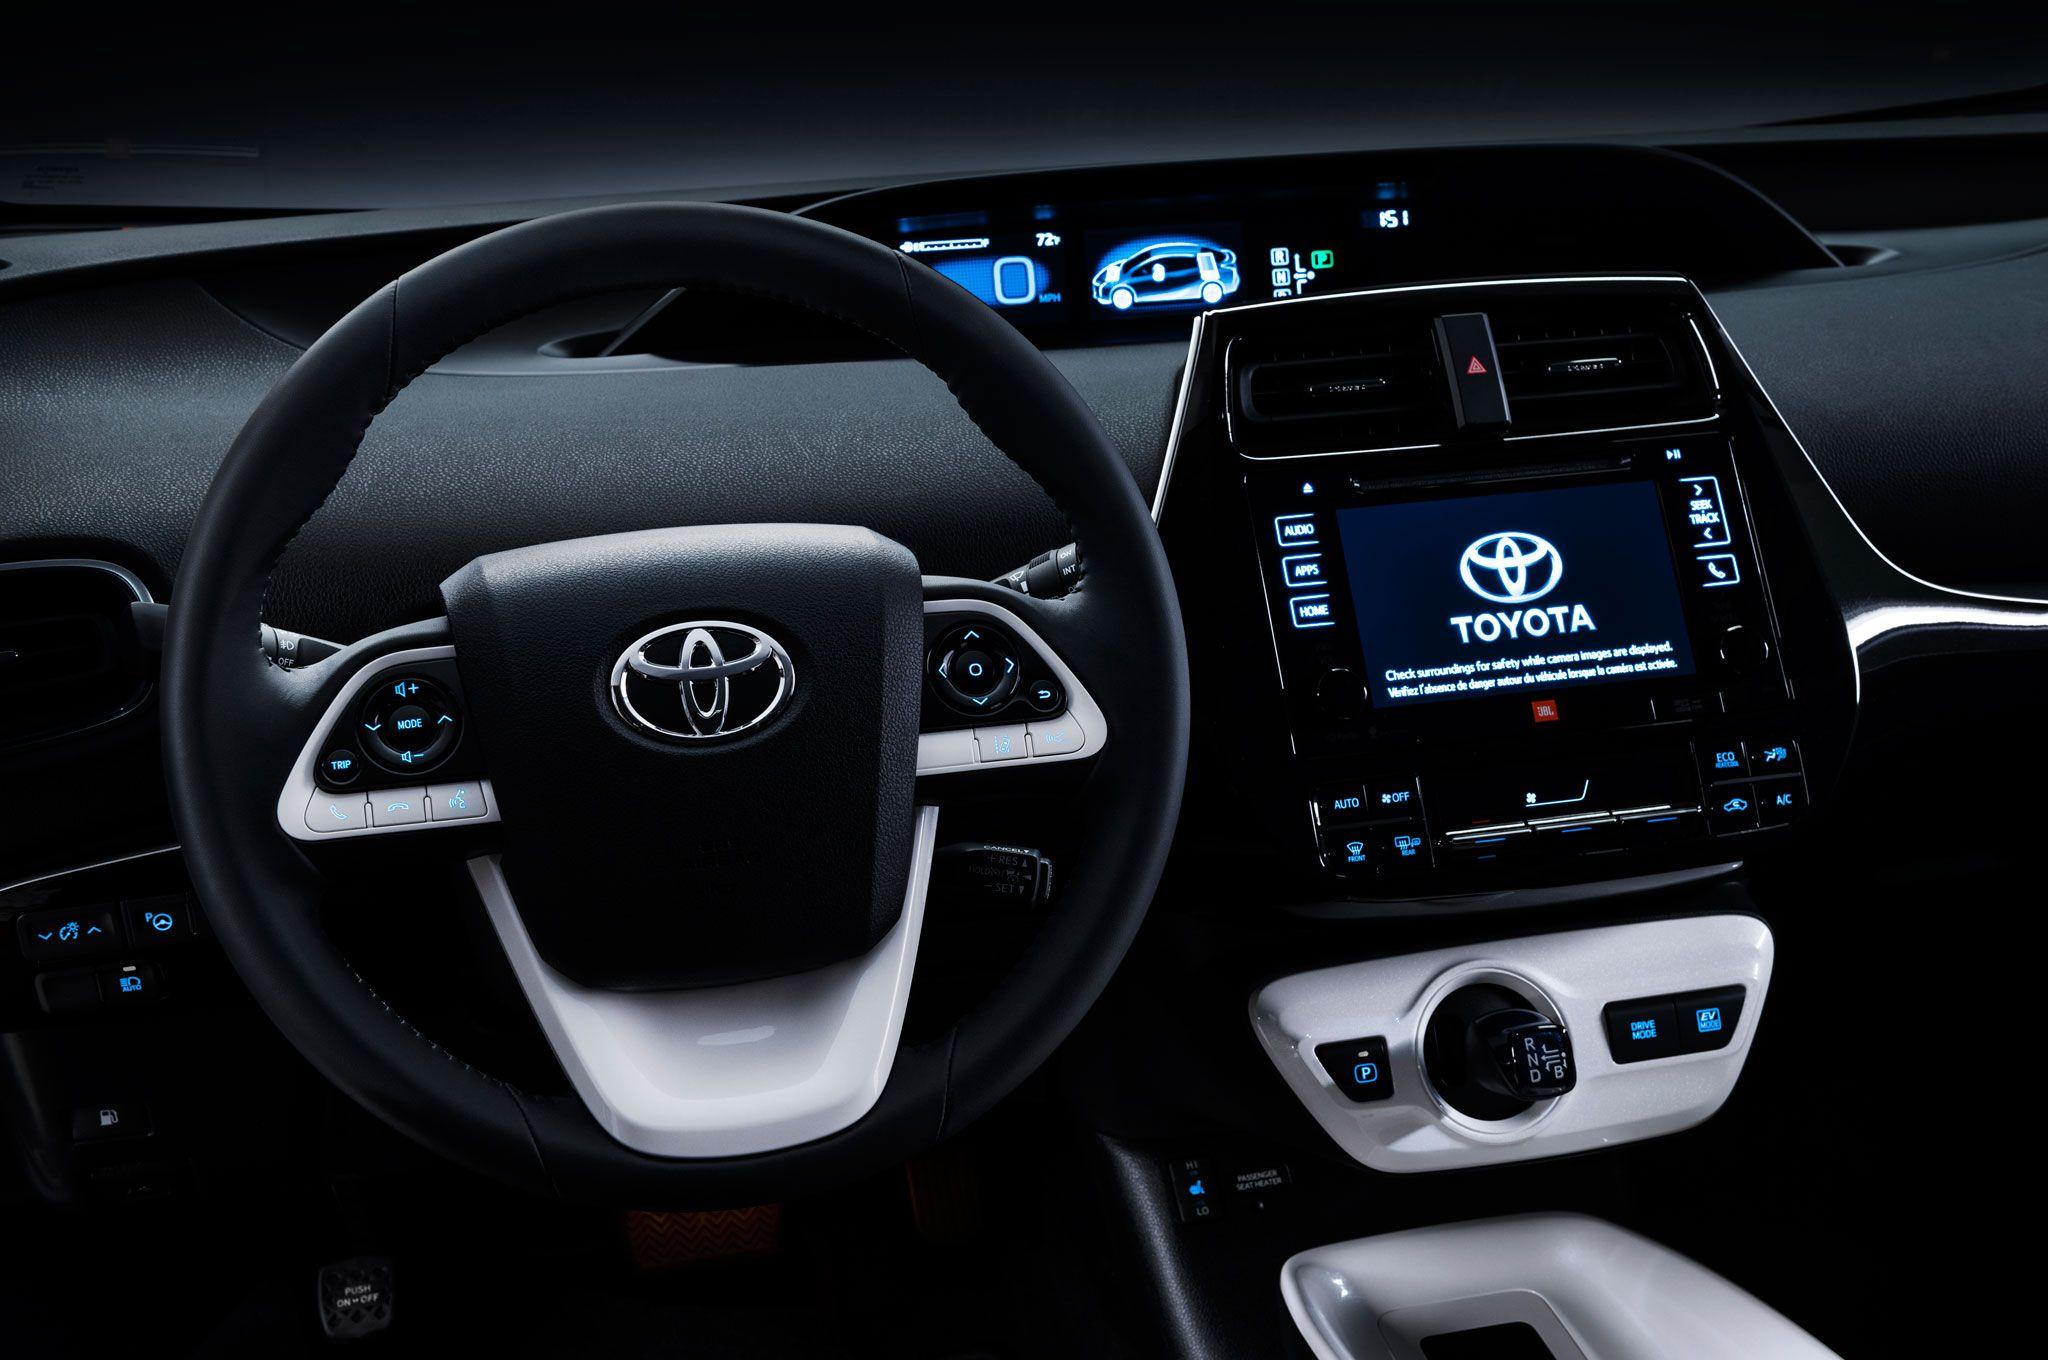 Pin By Lebogang On Lowla Toyota Prius Interior Toyota Prius Toyota